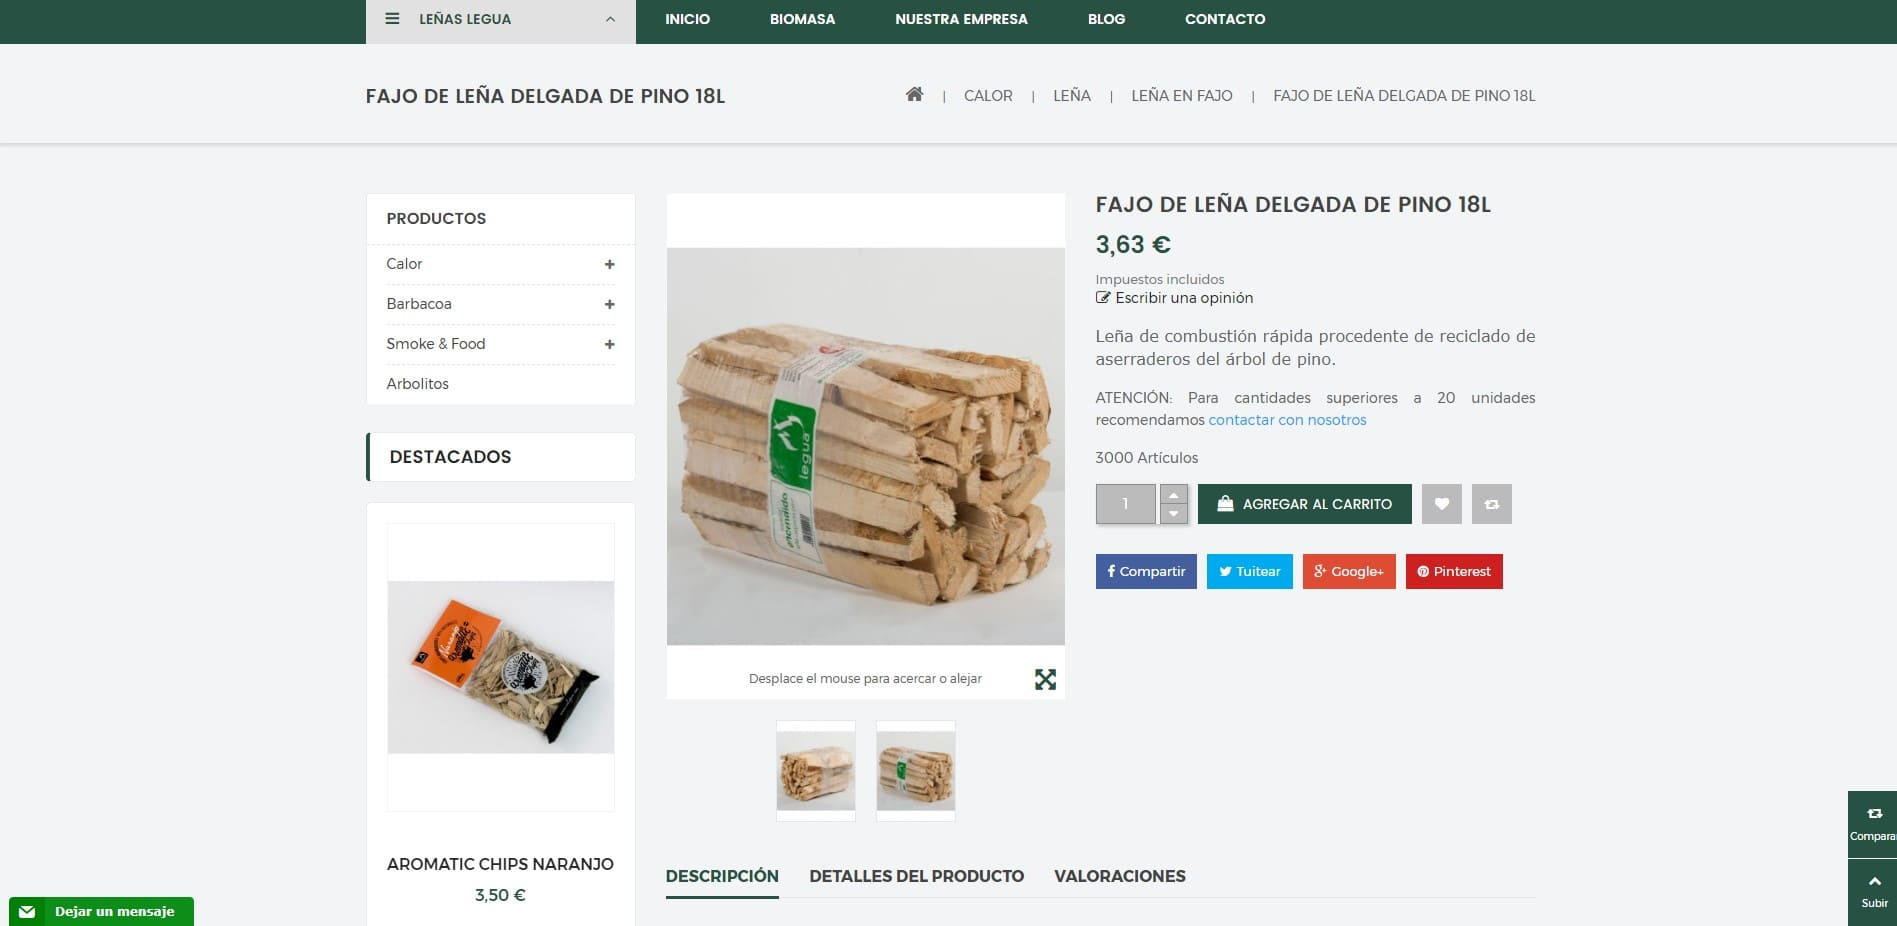 Tienda online Leñas Legua imagen 3